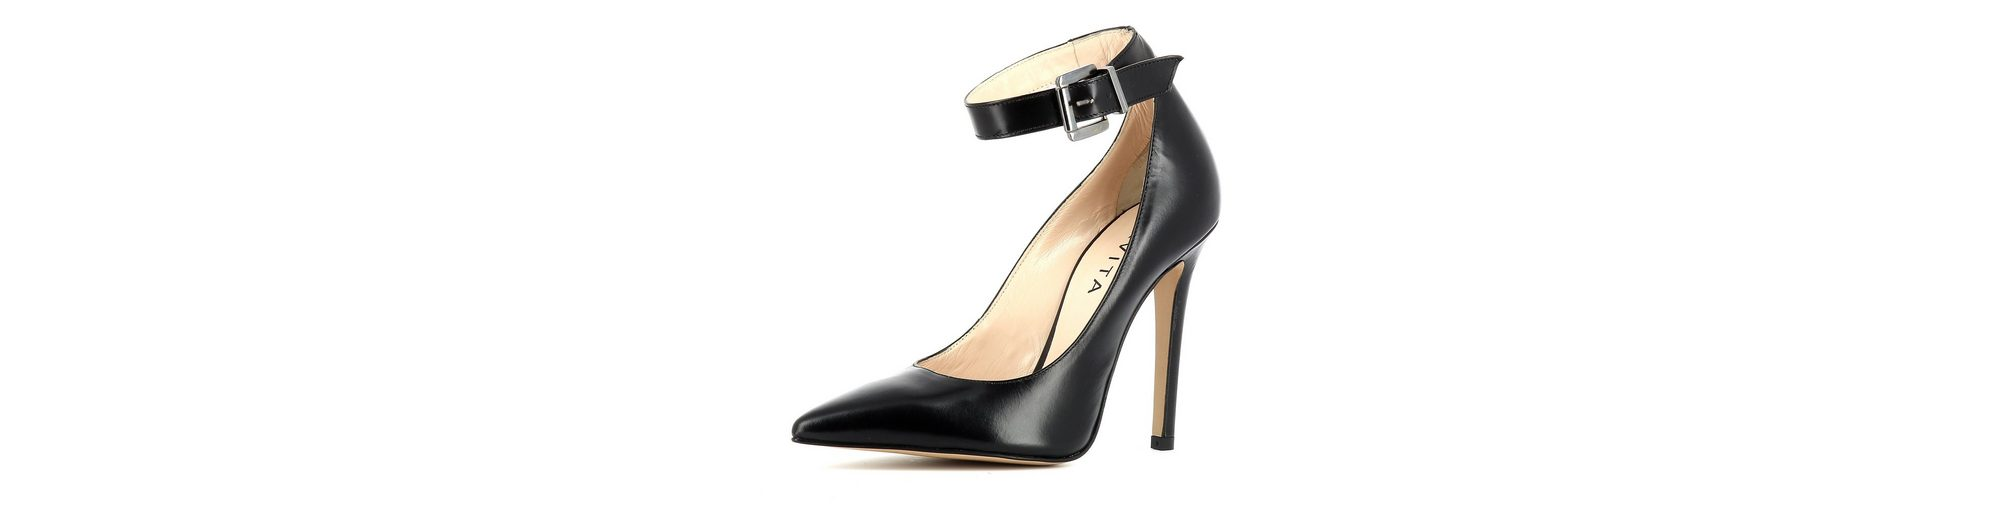 Evita LISA High-Heel-Pumps 100% Authentisch Günstig Online C59Hn1hEu